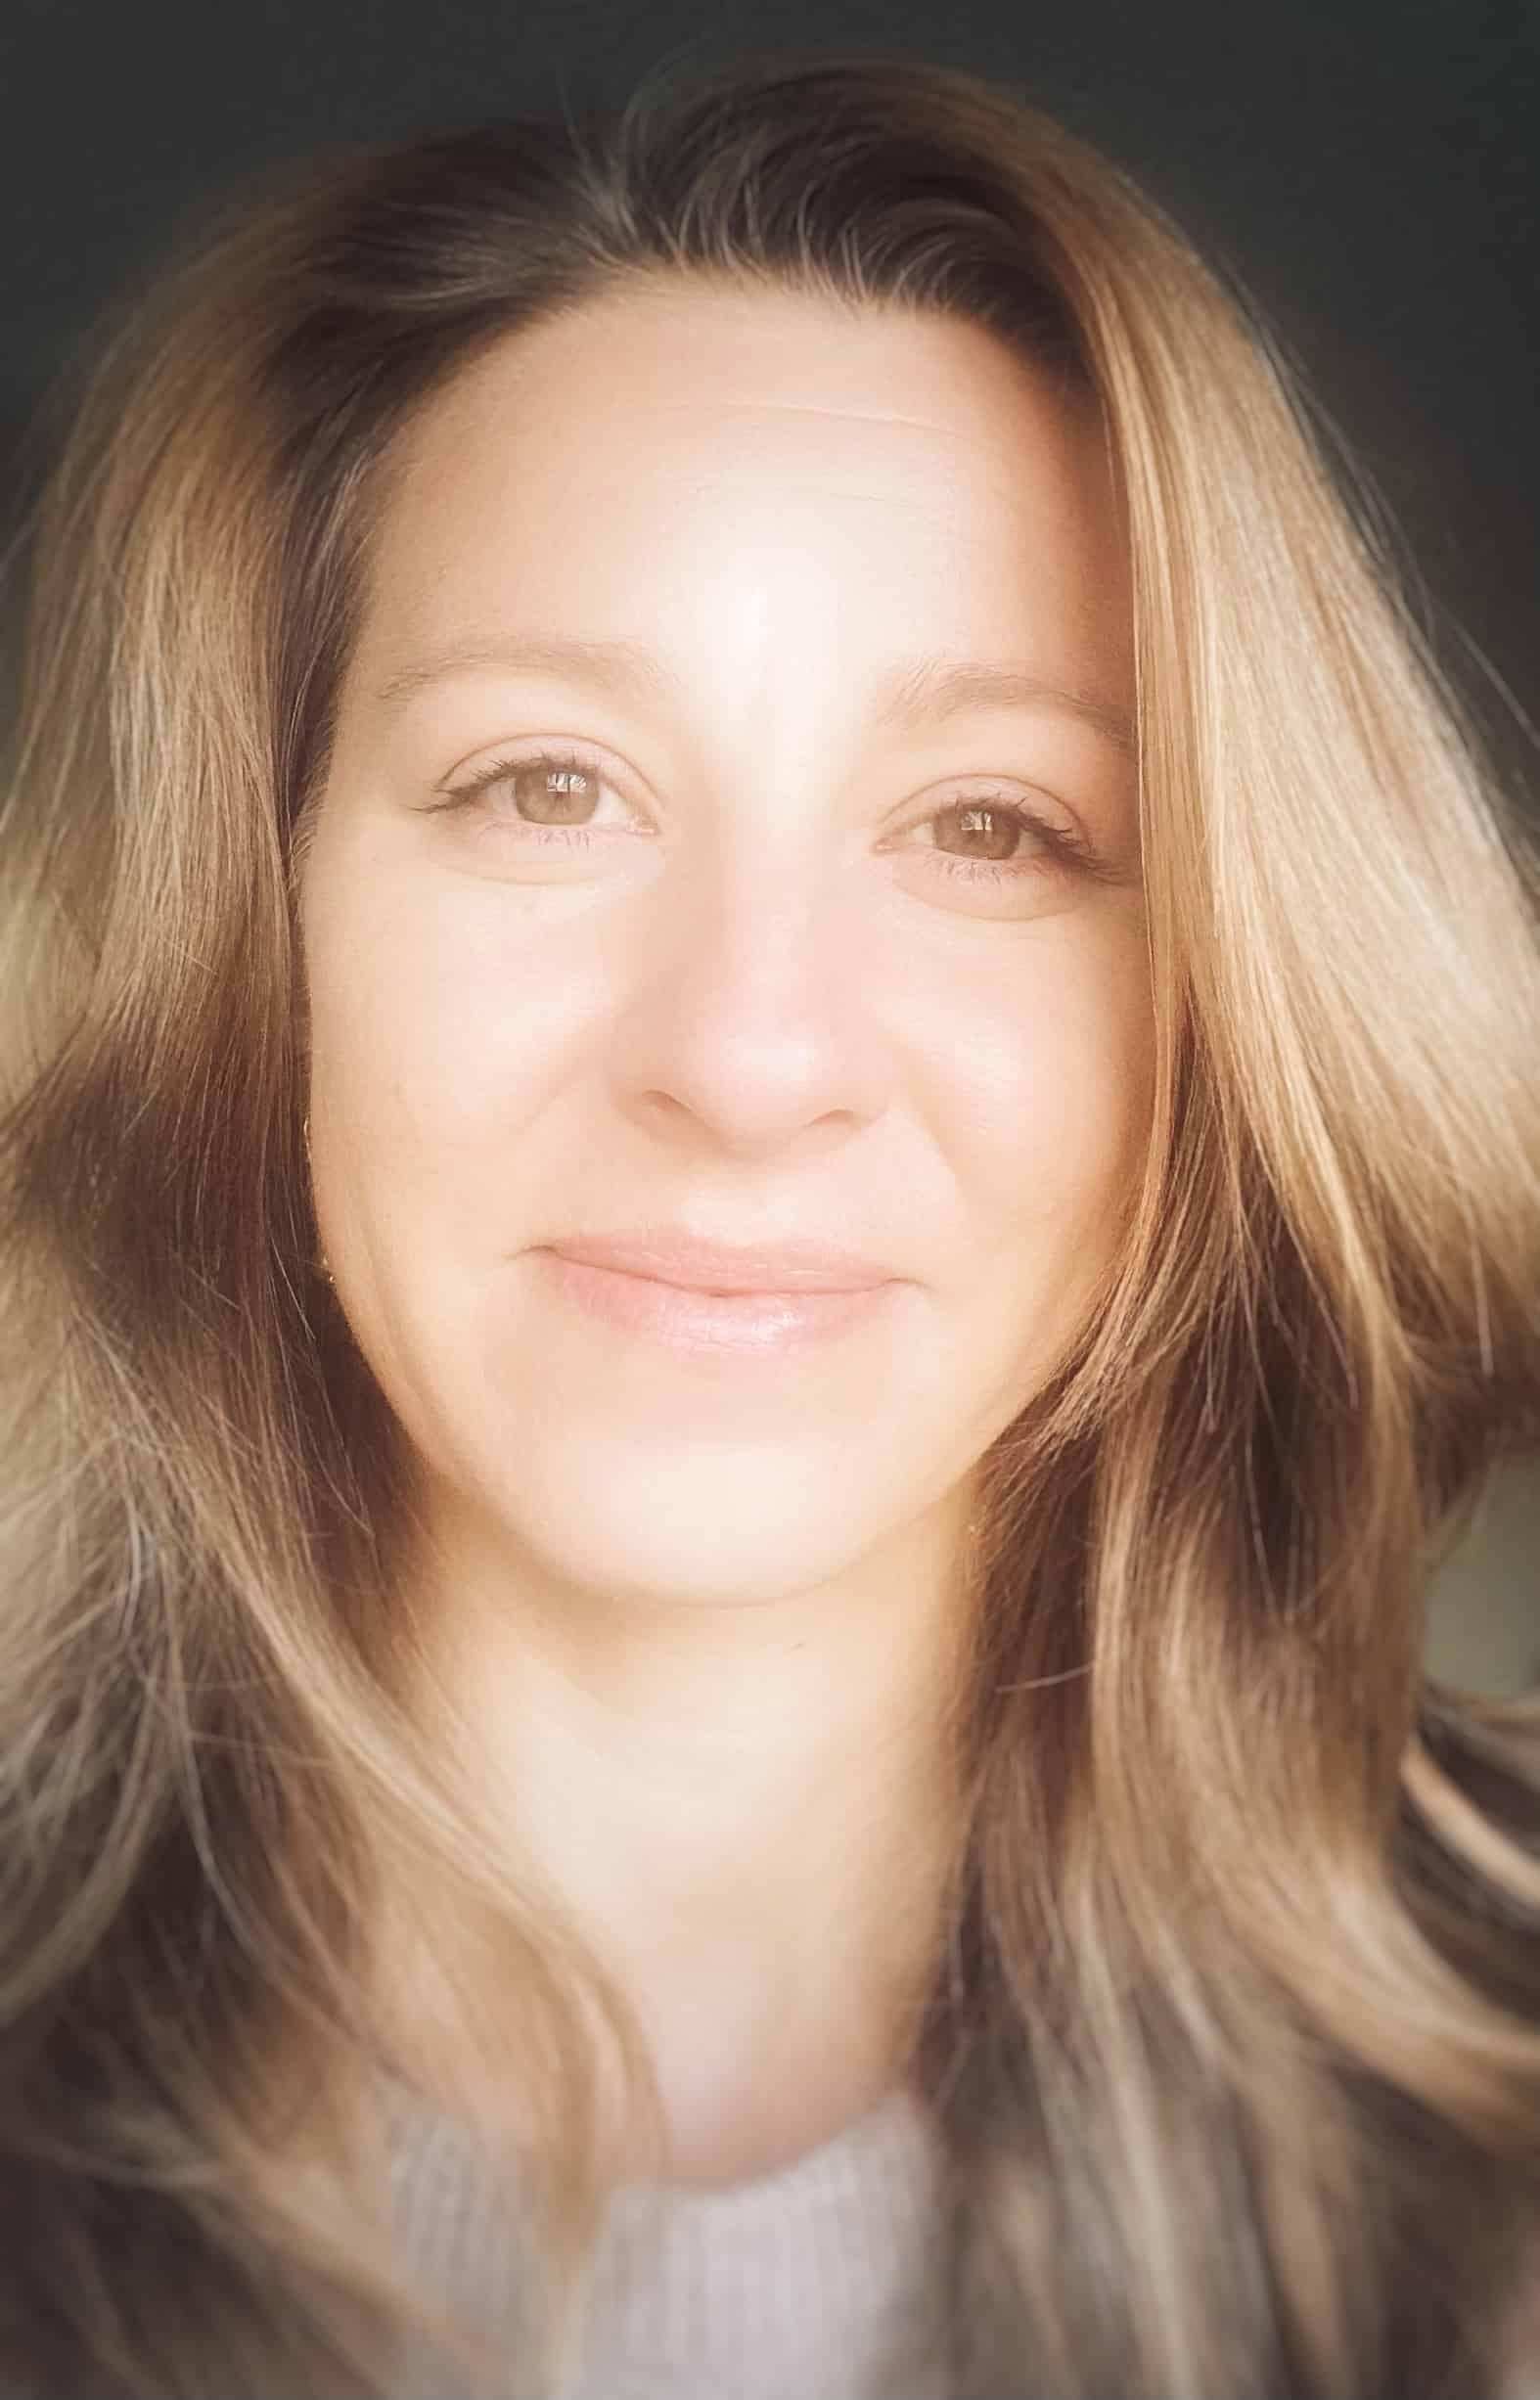 Karina Klmtchuk - Kai Wellness - Acupuncture in Los Angeles